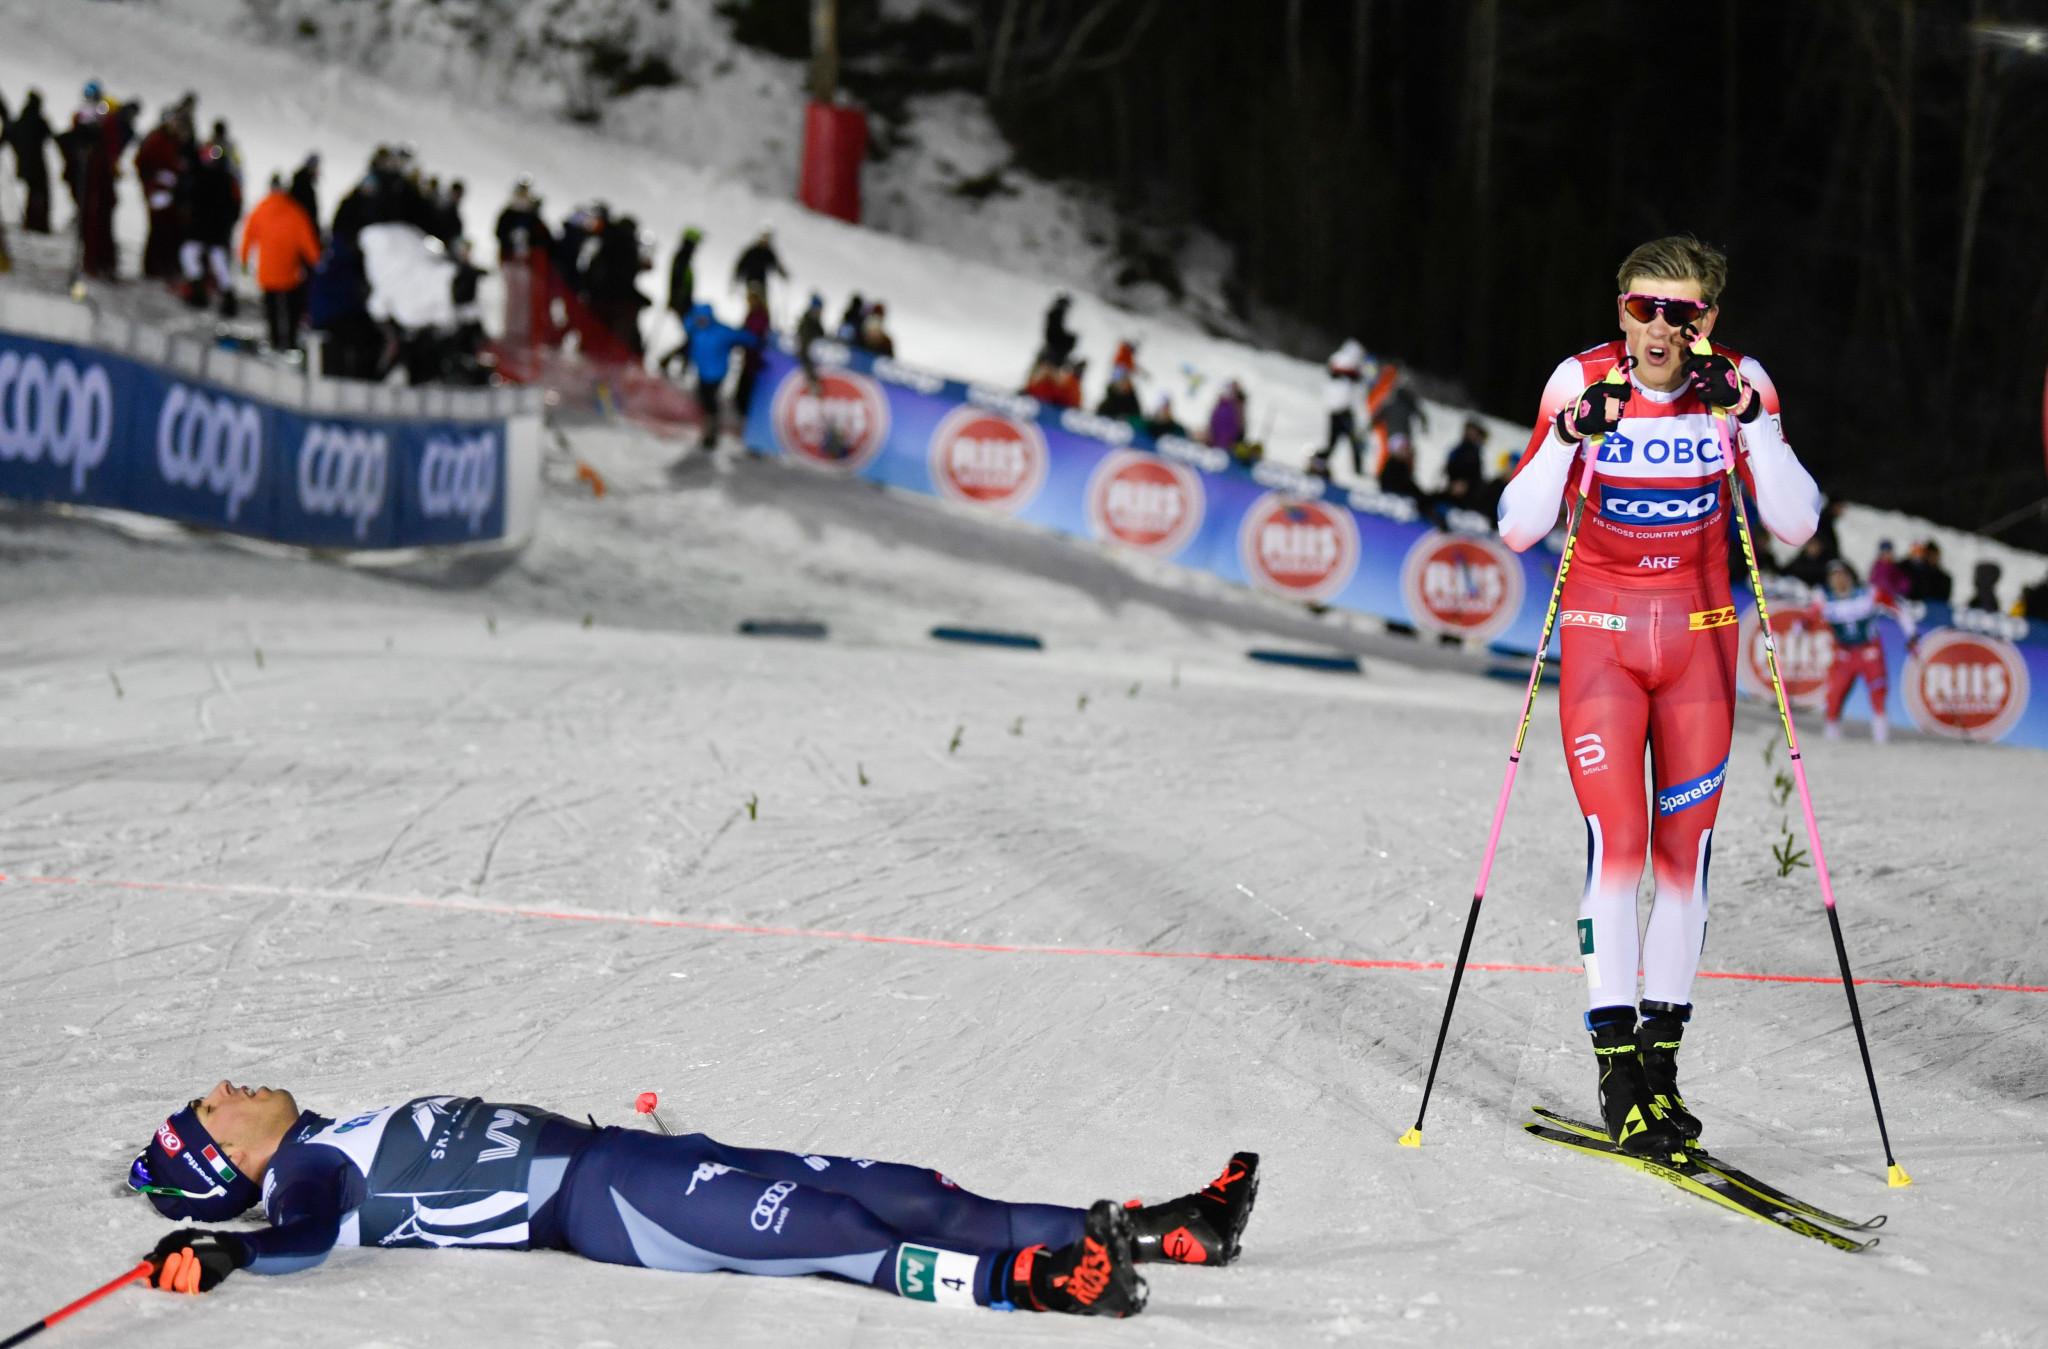 Johannes Høsflot Klæbo, right, beat Italy's Federico Pellegrino in the men's sprint final ©Getty Images